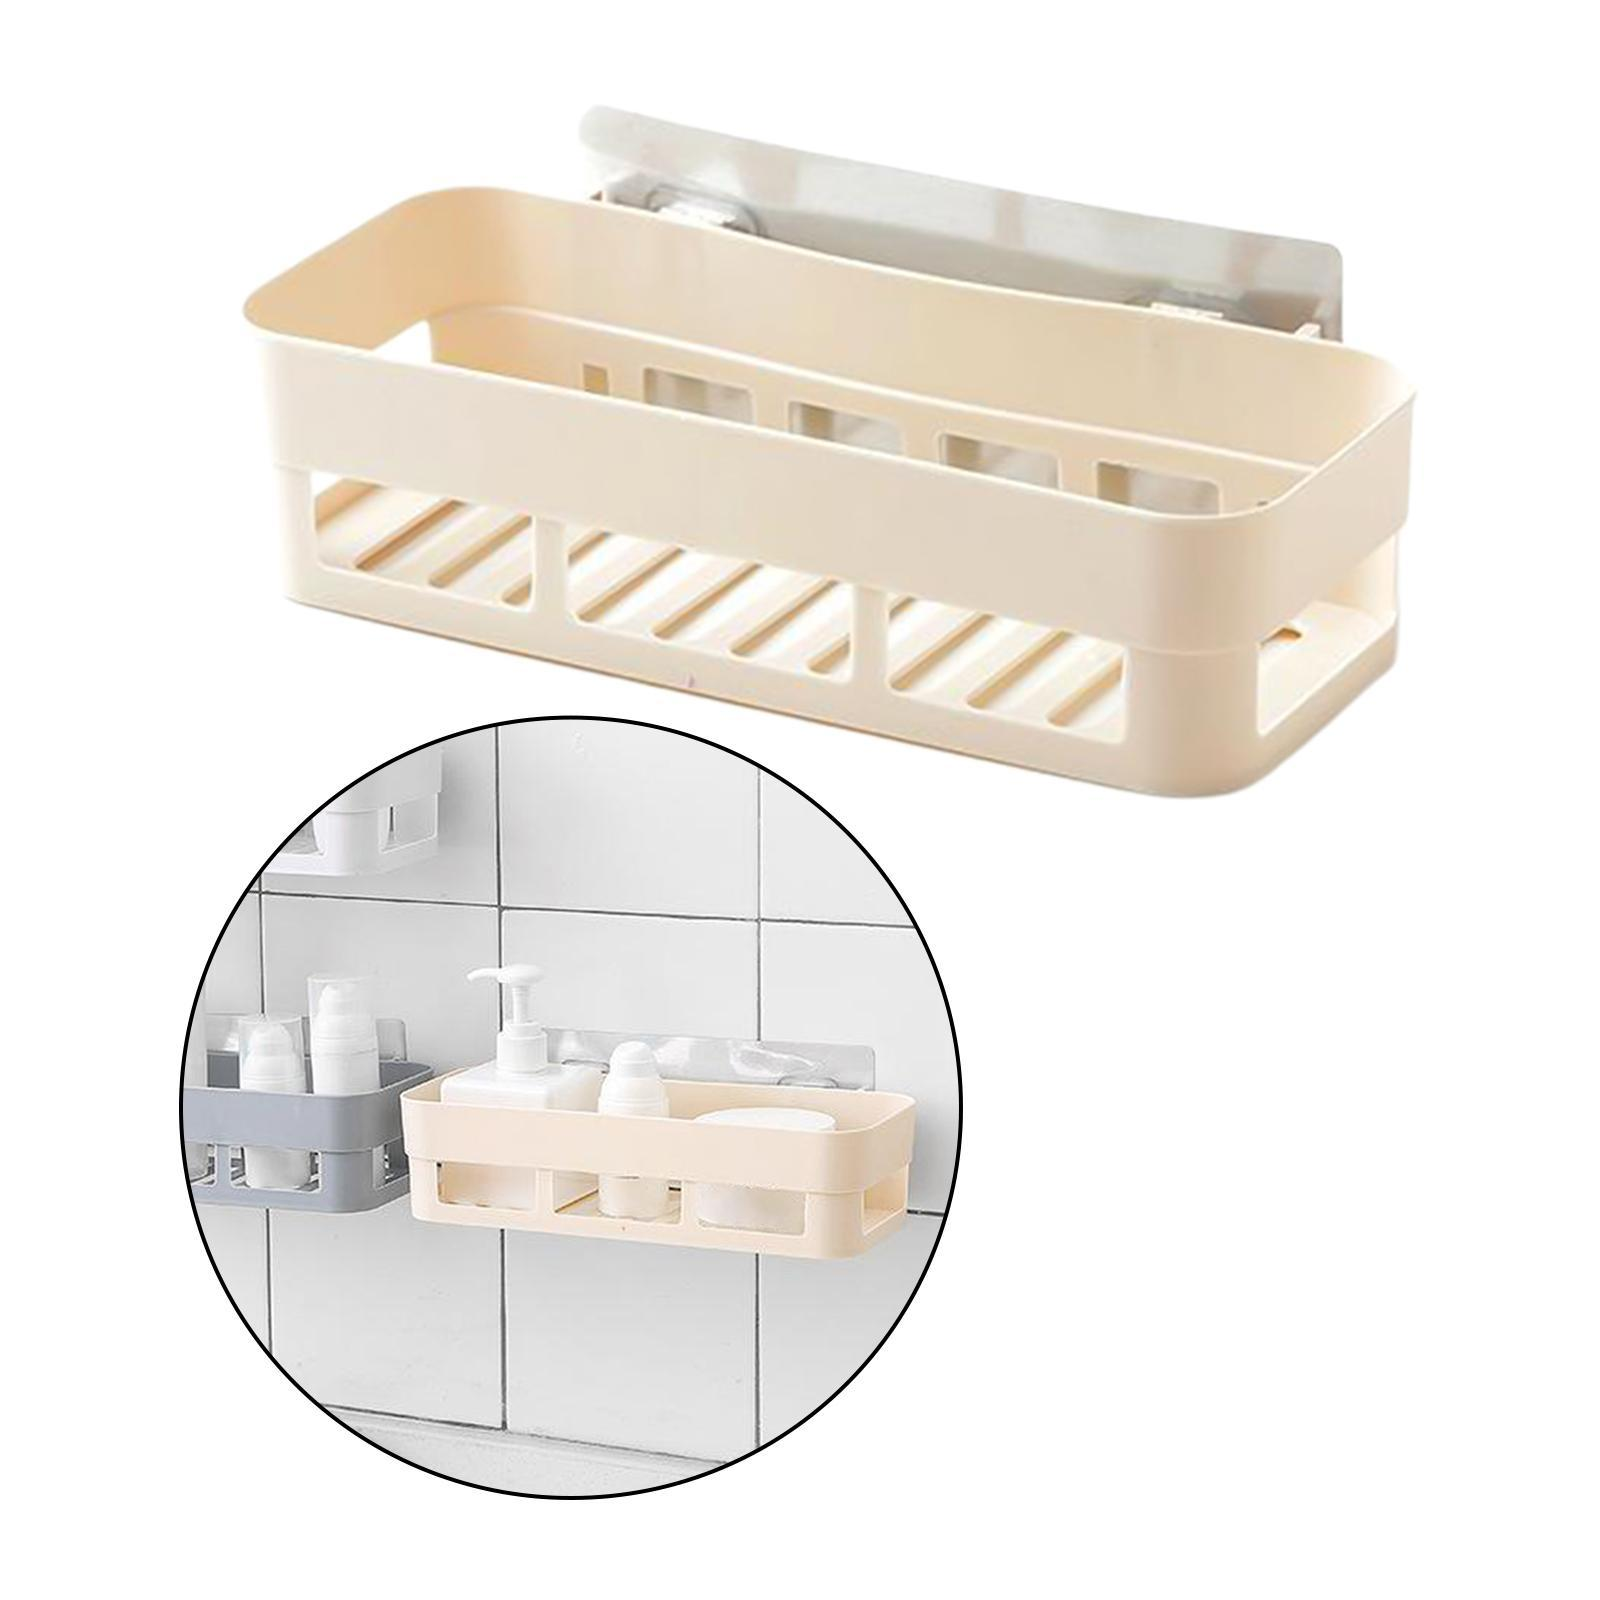 thumbnail 7 - Self-Adhesive-Shower-Shelf-Plastic-Shower-Caddy-Organiser-Bathroom-Shelf